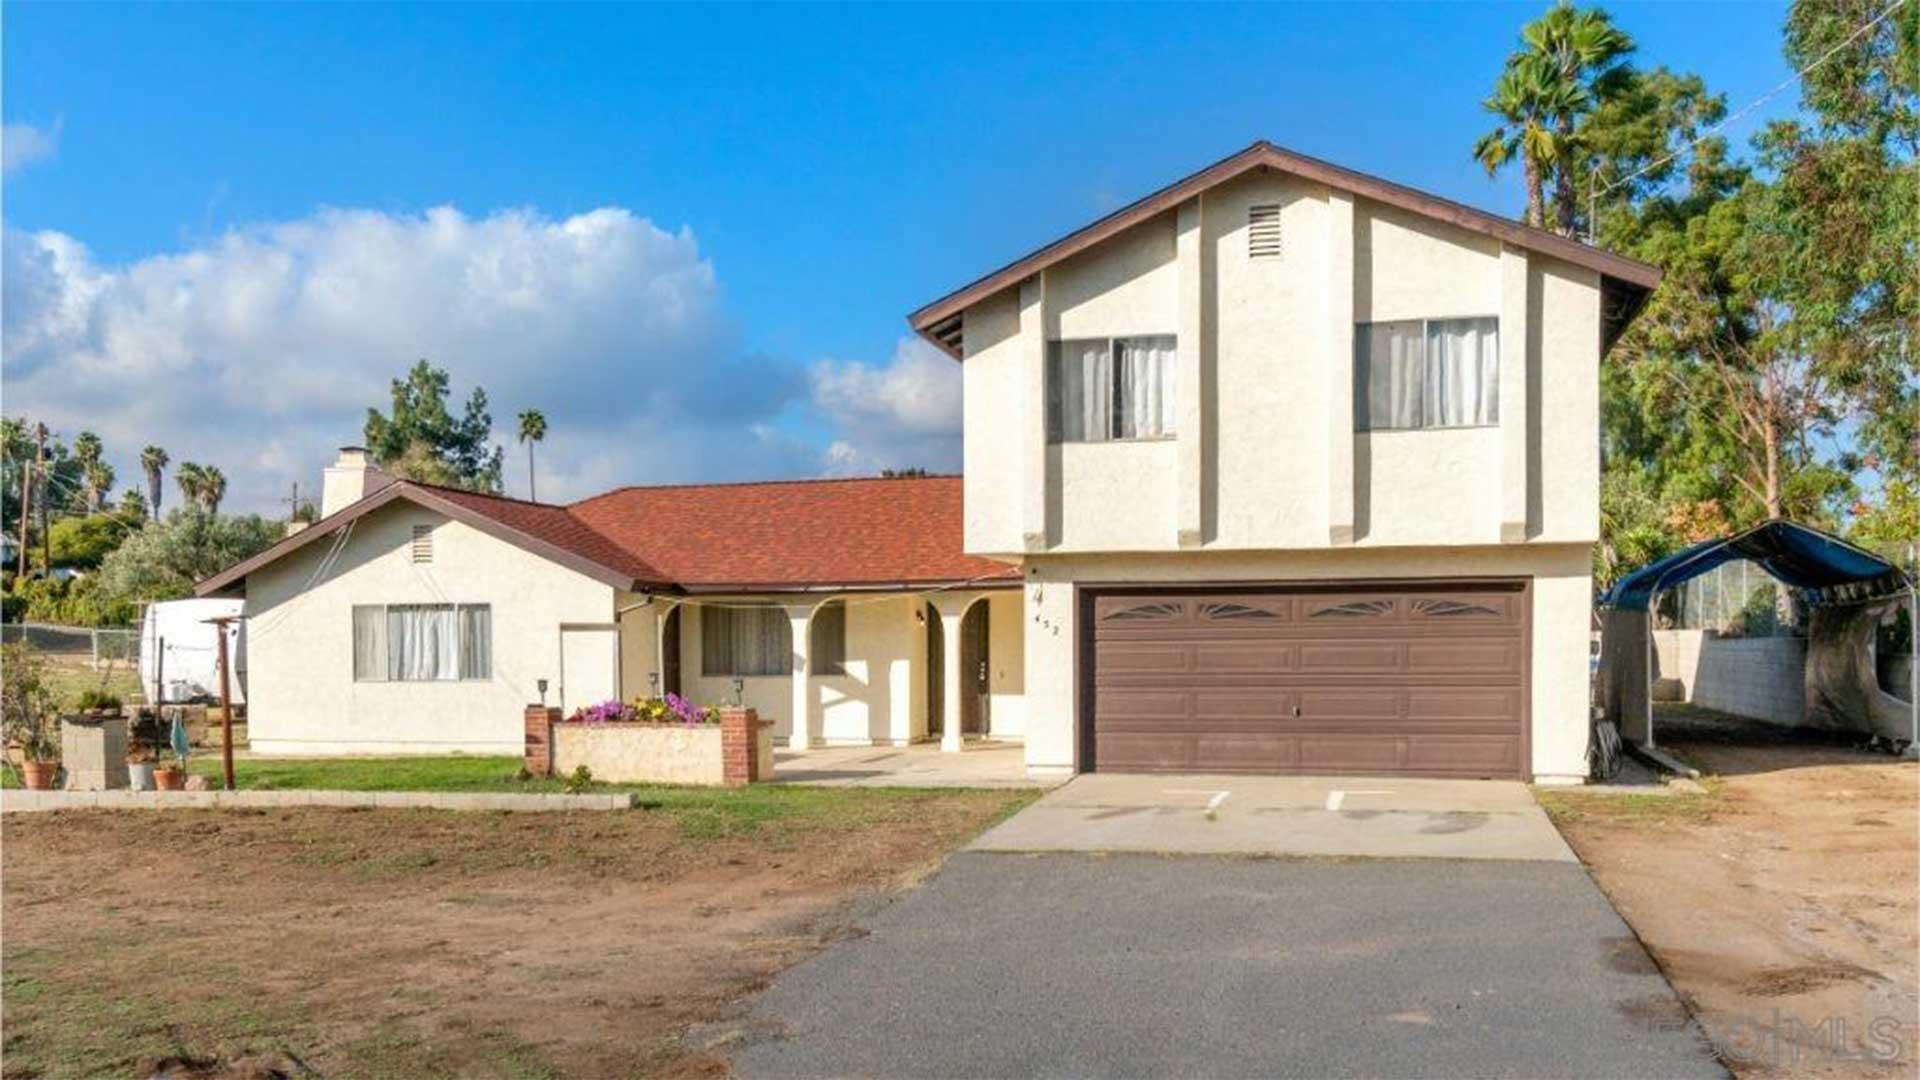 452 Barsby St. Vista, CA 92084